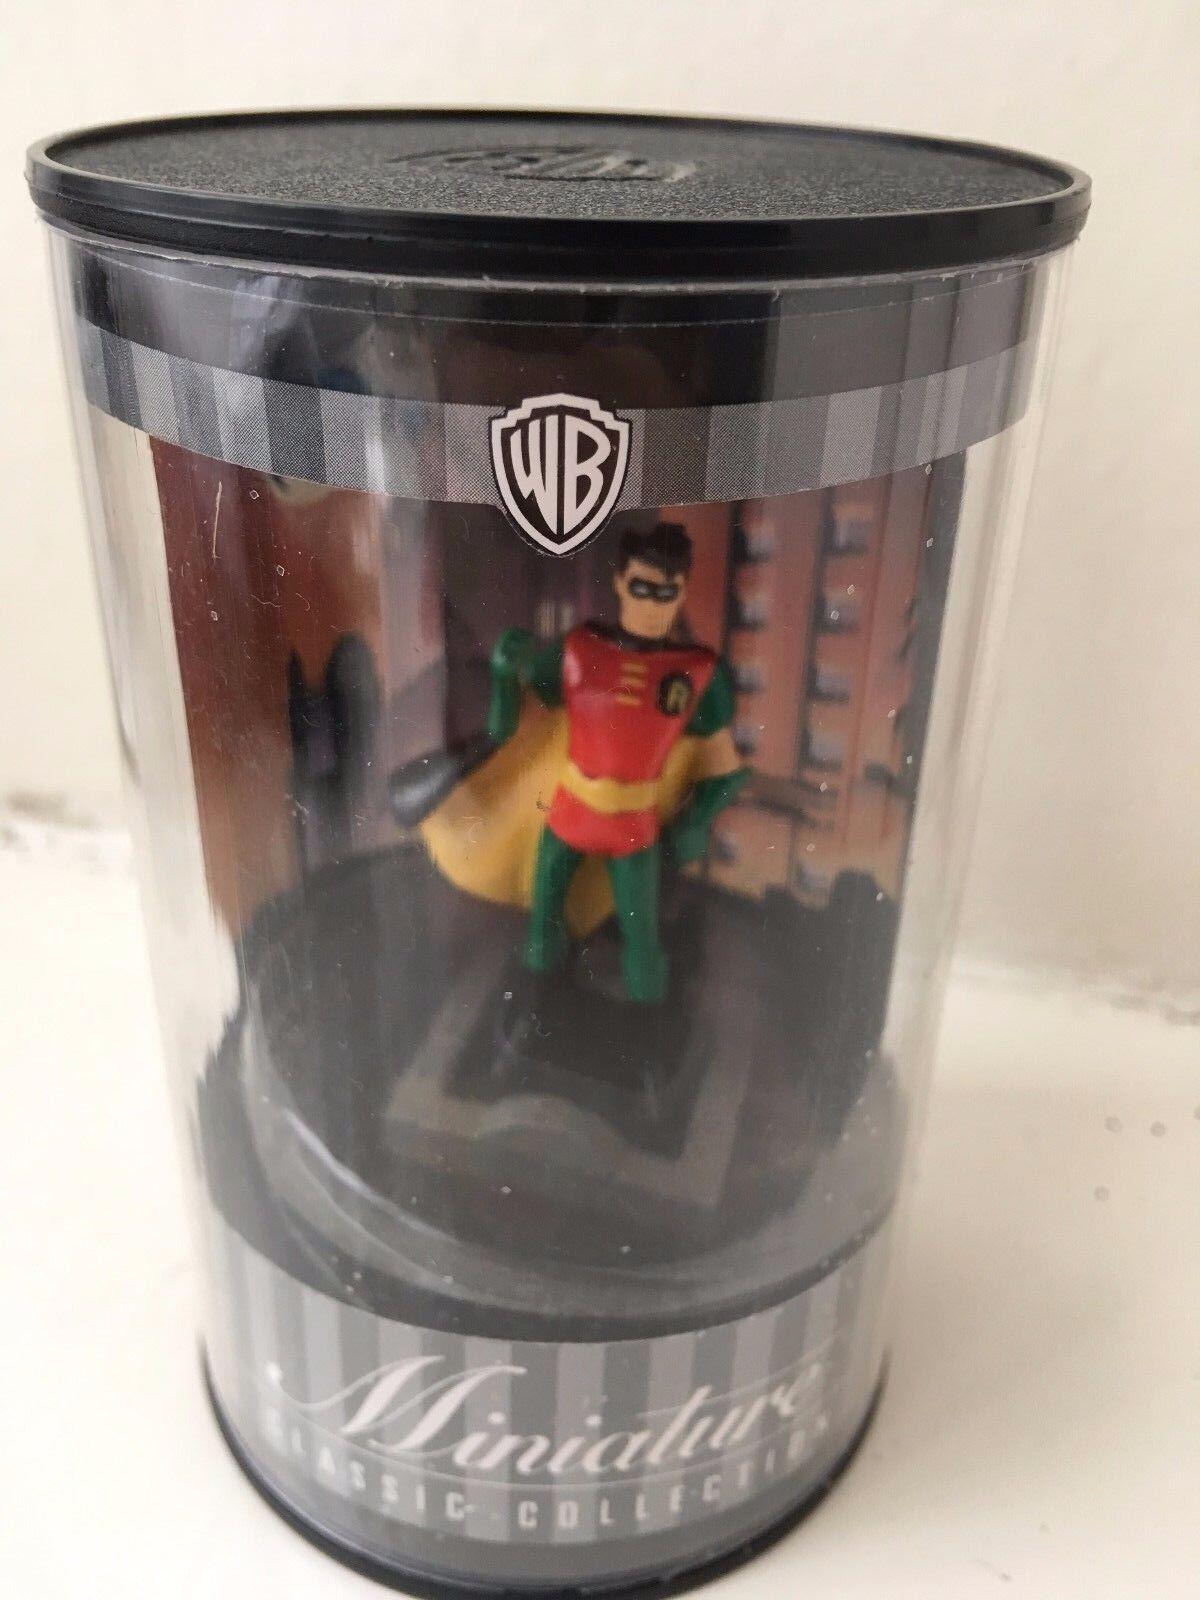 Warner bros miniatur - classic collection animierte figur batman, robin statue